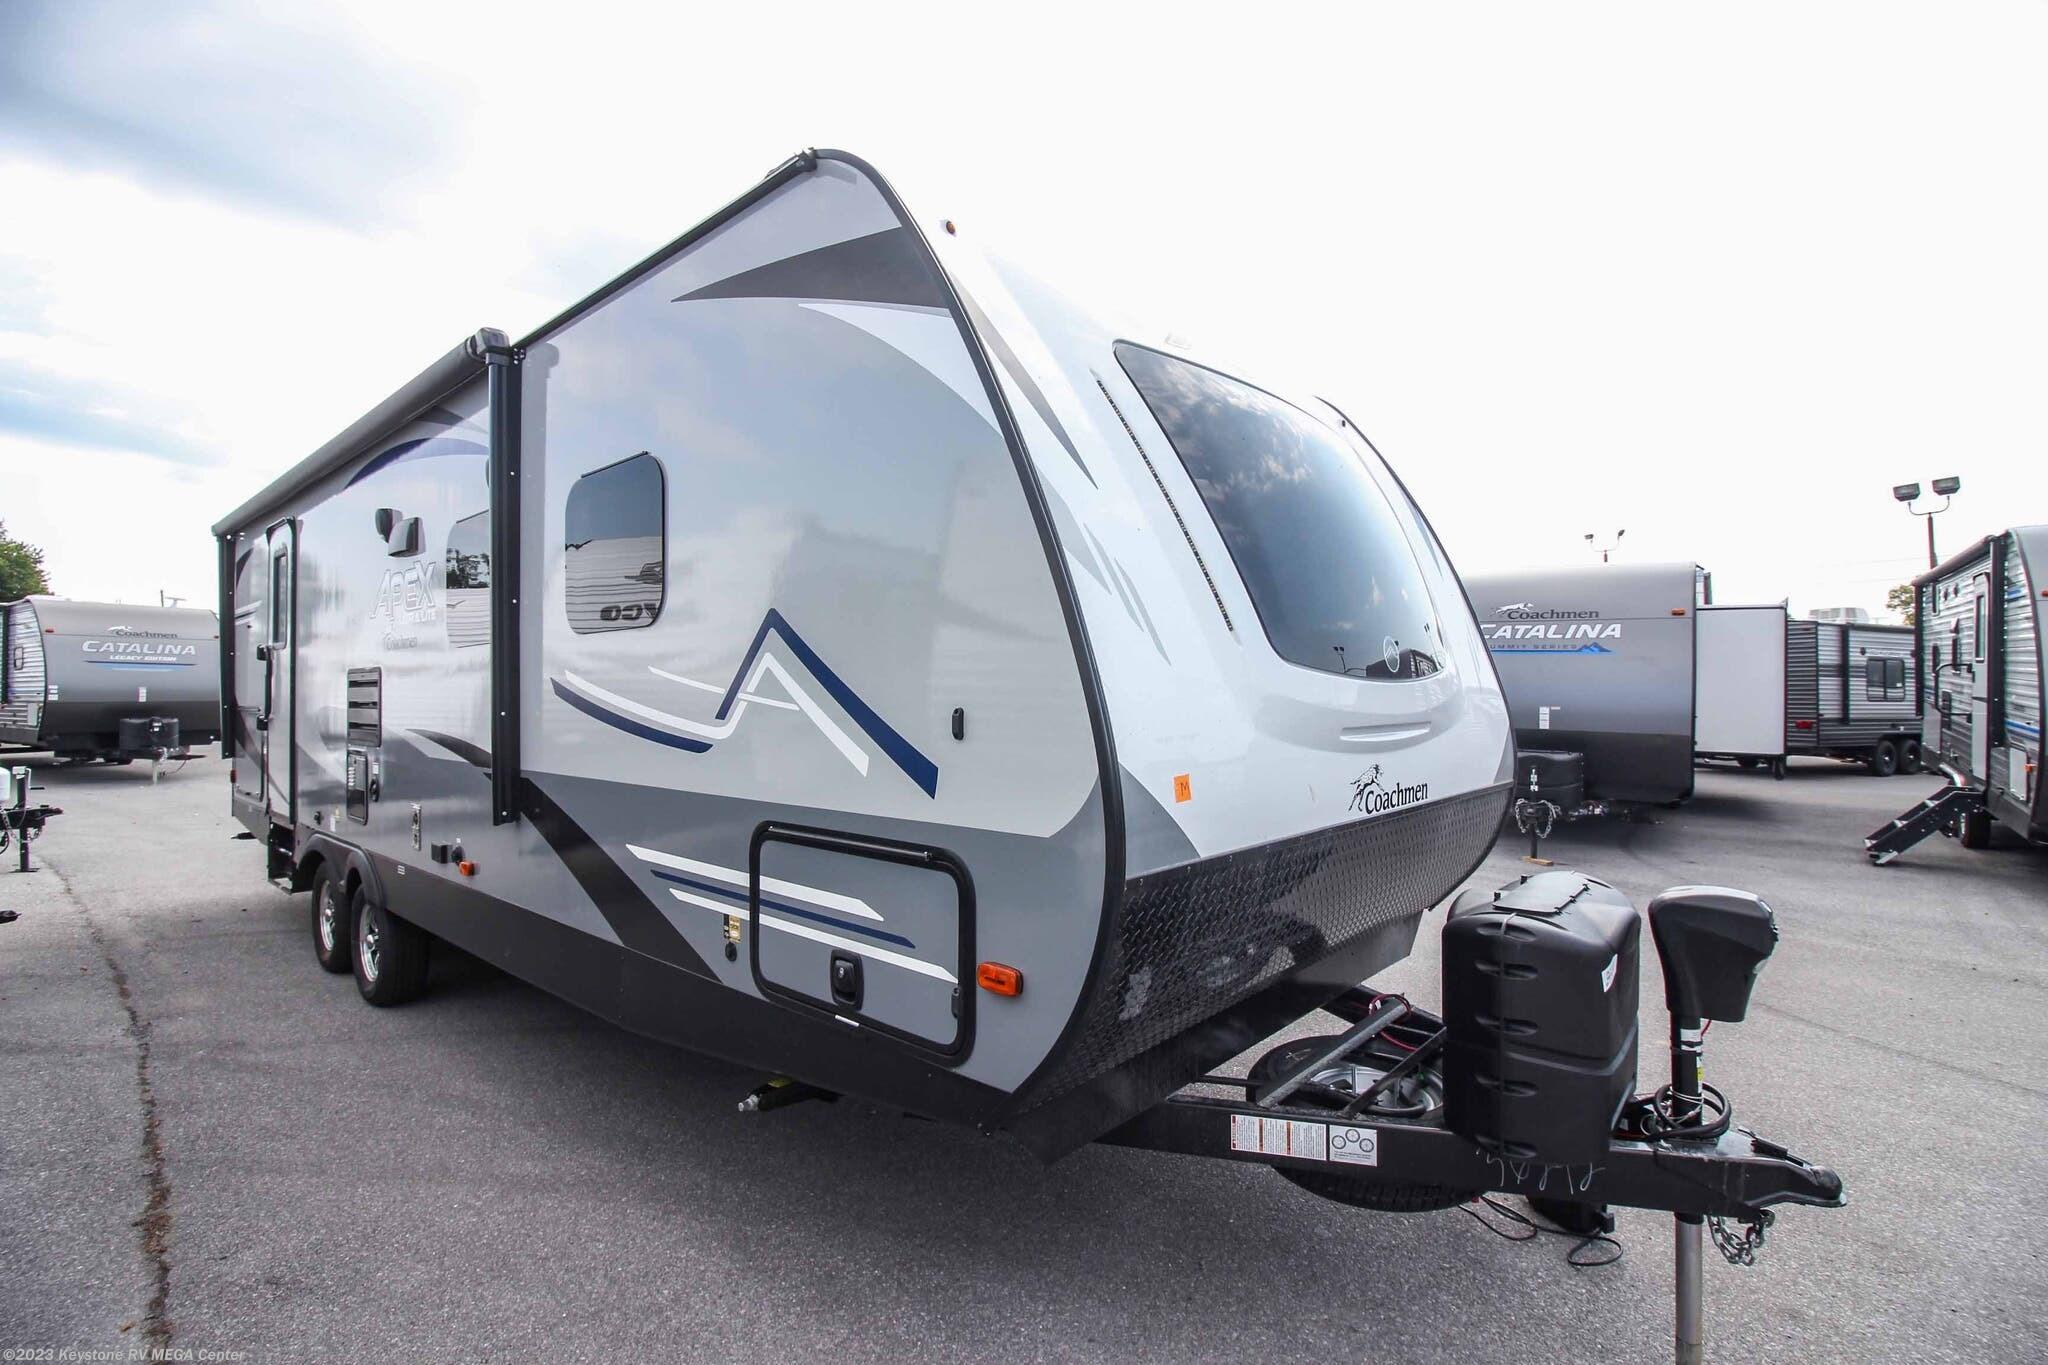 14158 - 2020 Coachmen Apex 265RBSS Travel Trailer for sale